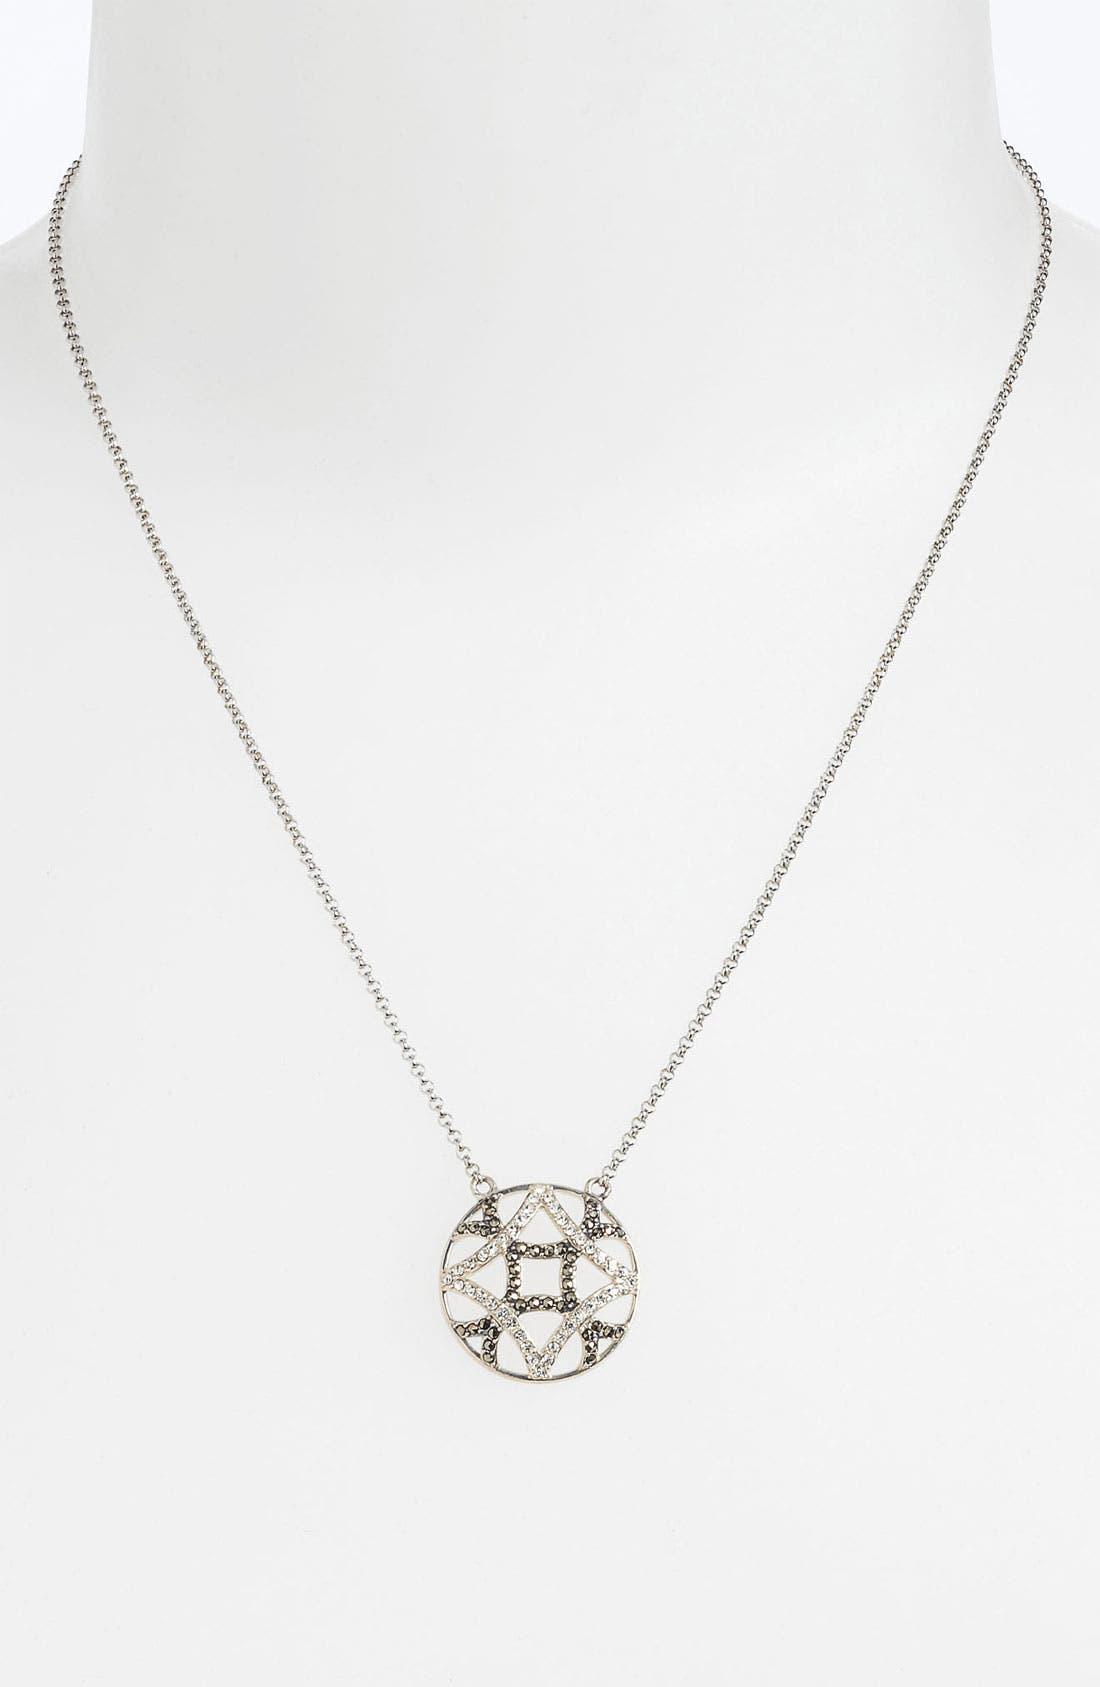 Alternate Image 1 Selected - Judith Jack 'Turq Matrix' Pendant Necklace